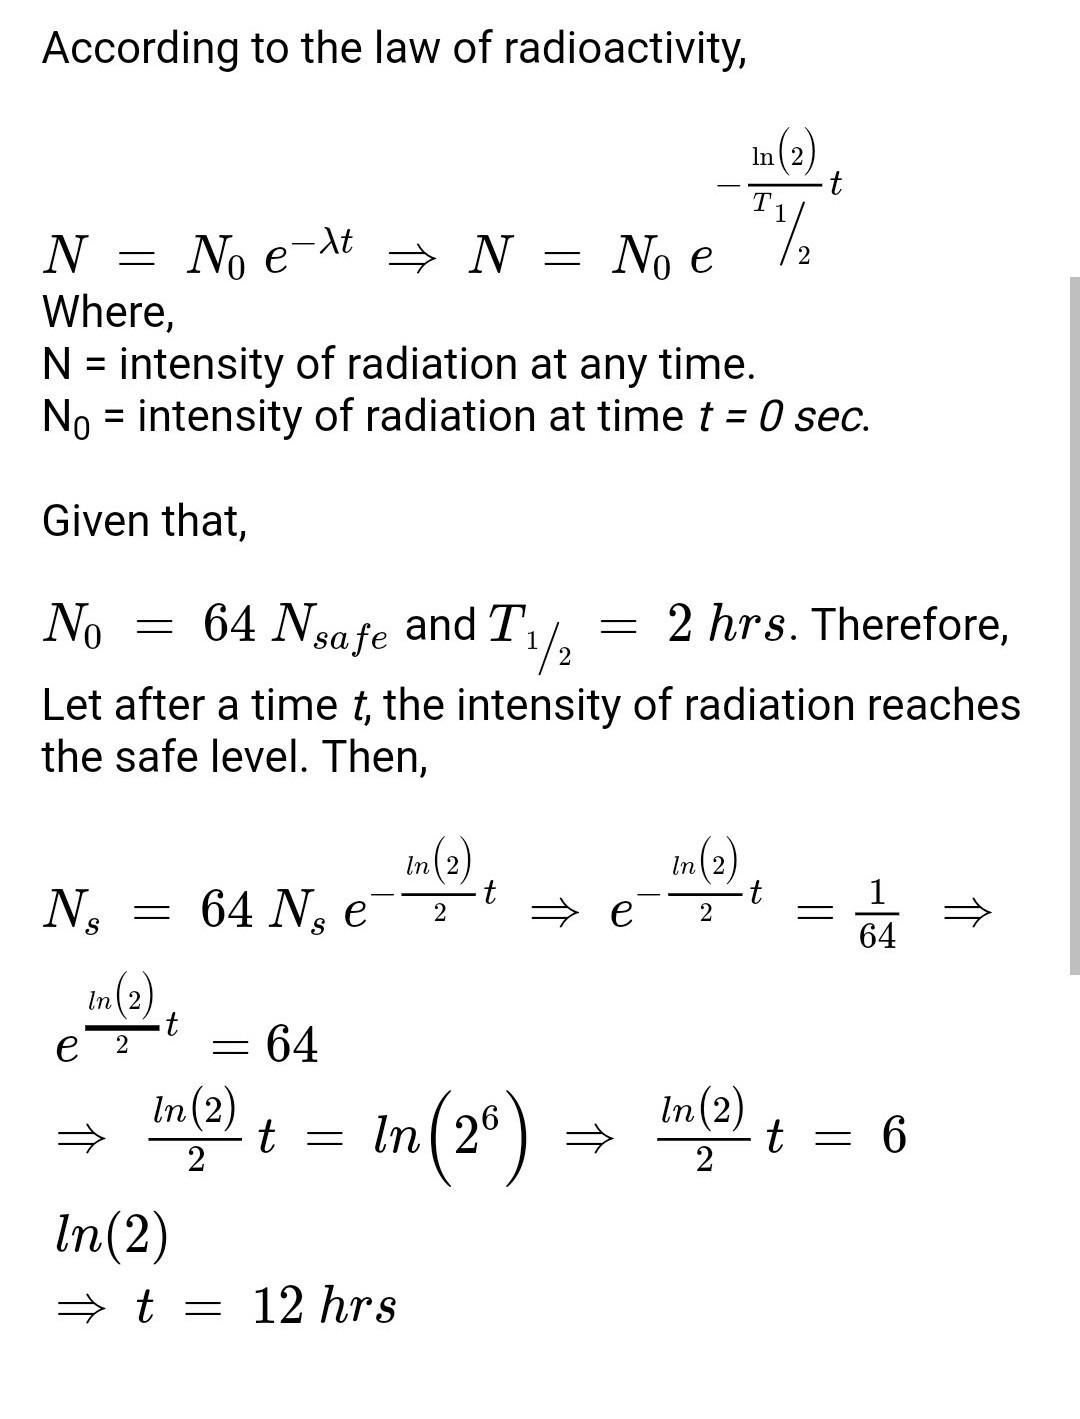 A Freshly Prepared Radioactive Source Of Half Life 2h